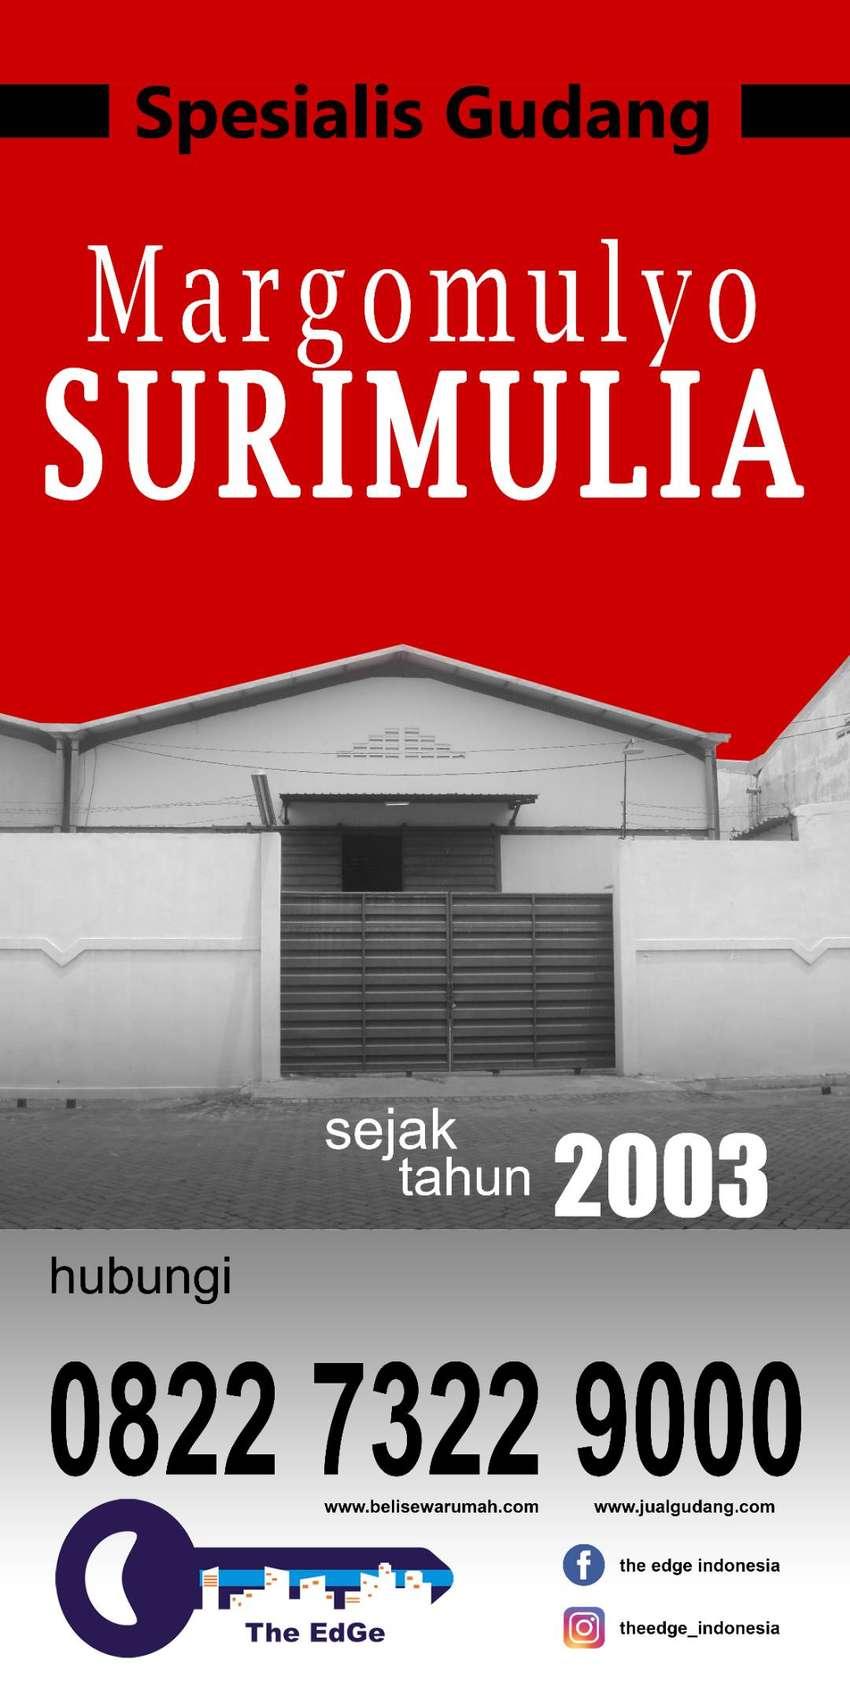 Sewa Gudang di Surabaya Margomulyo Surimulia - The EdGe 0